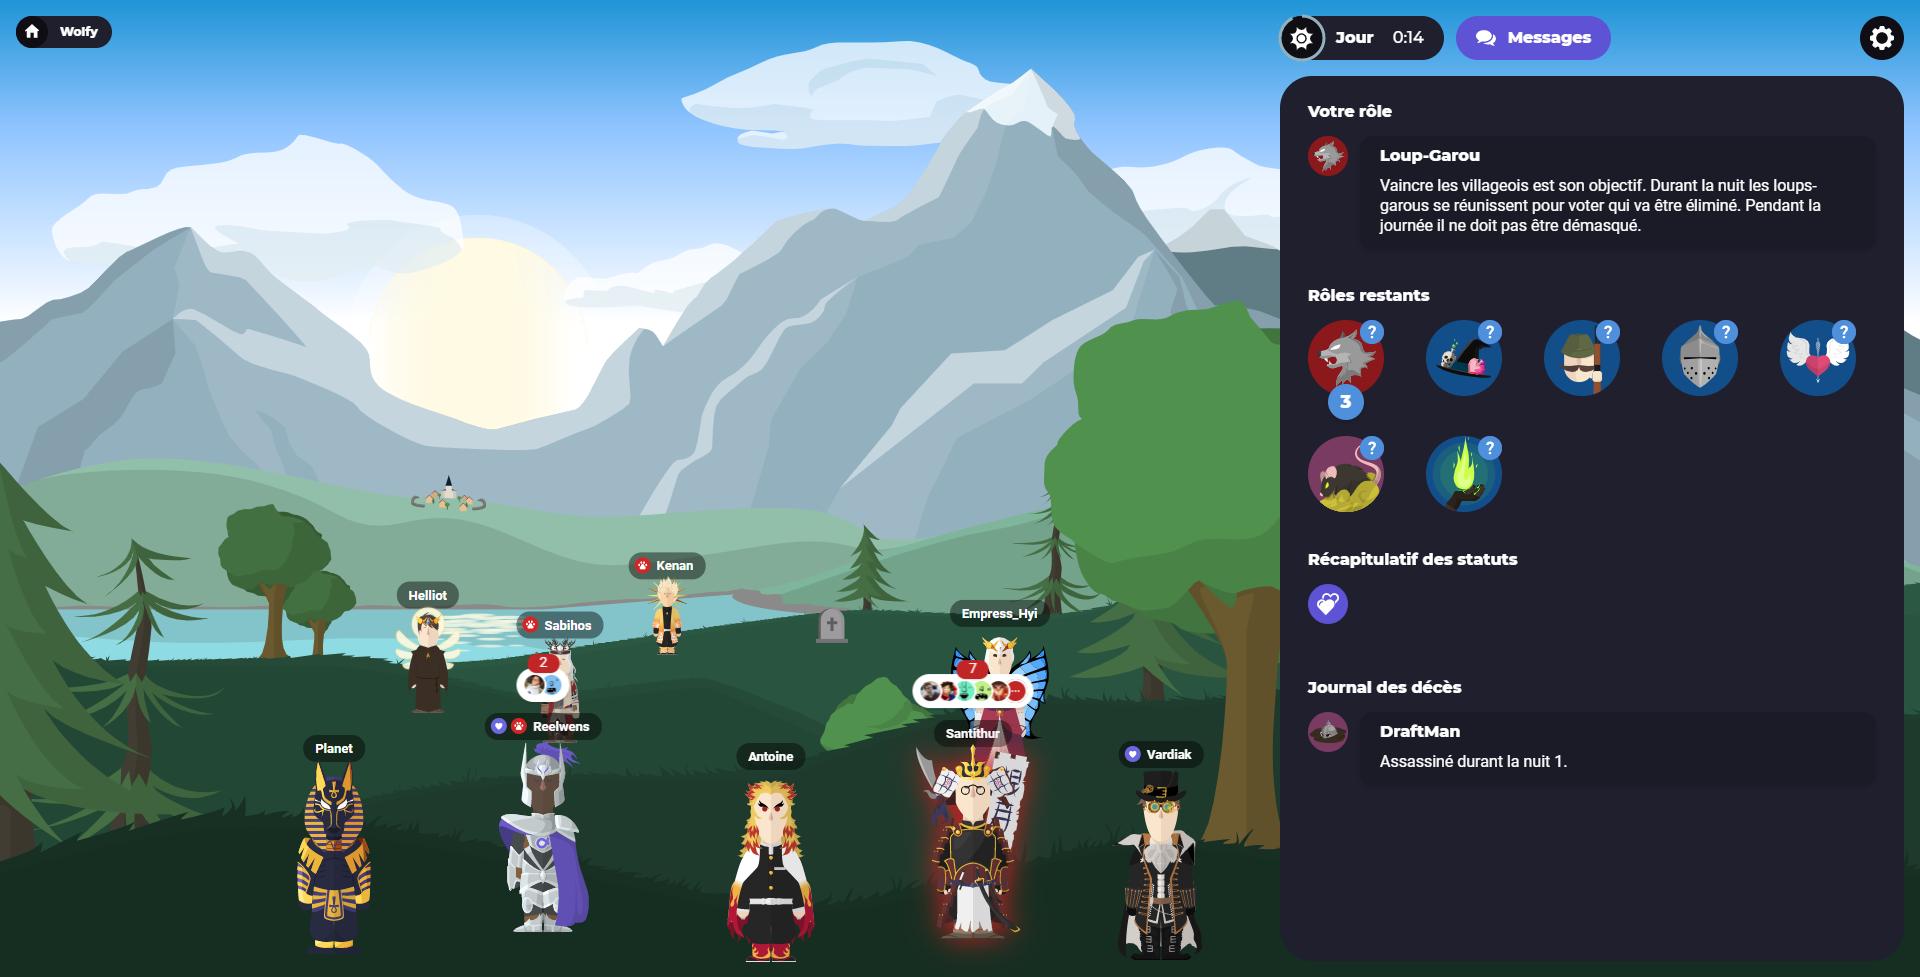 Screenshot milieu de partie sur Wolfy